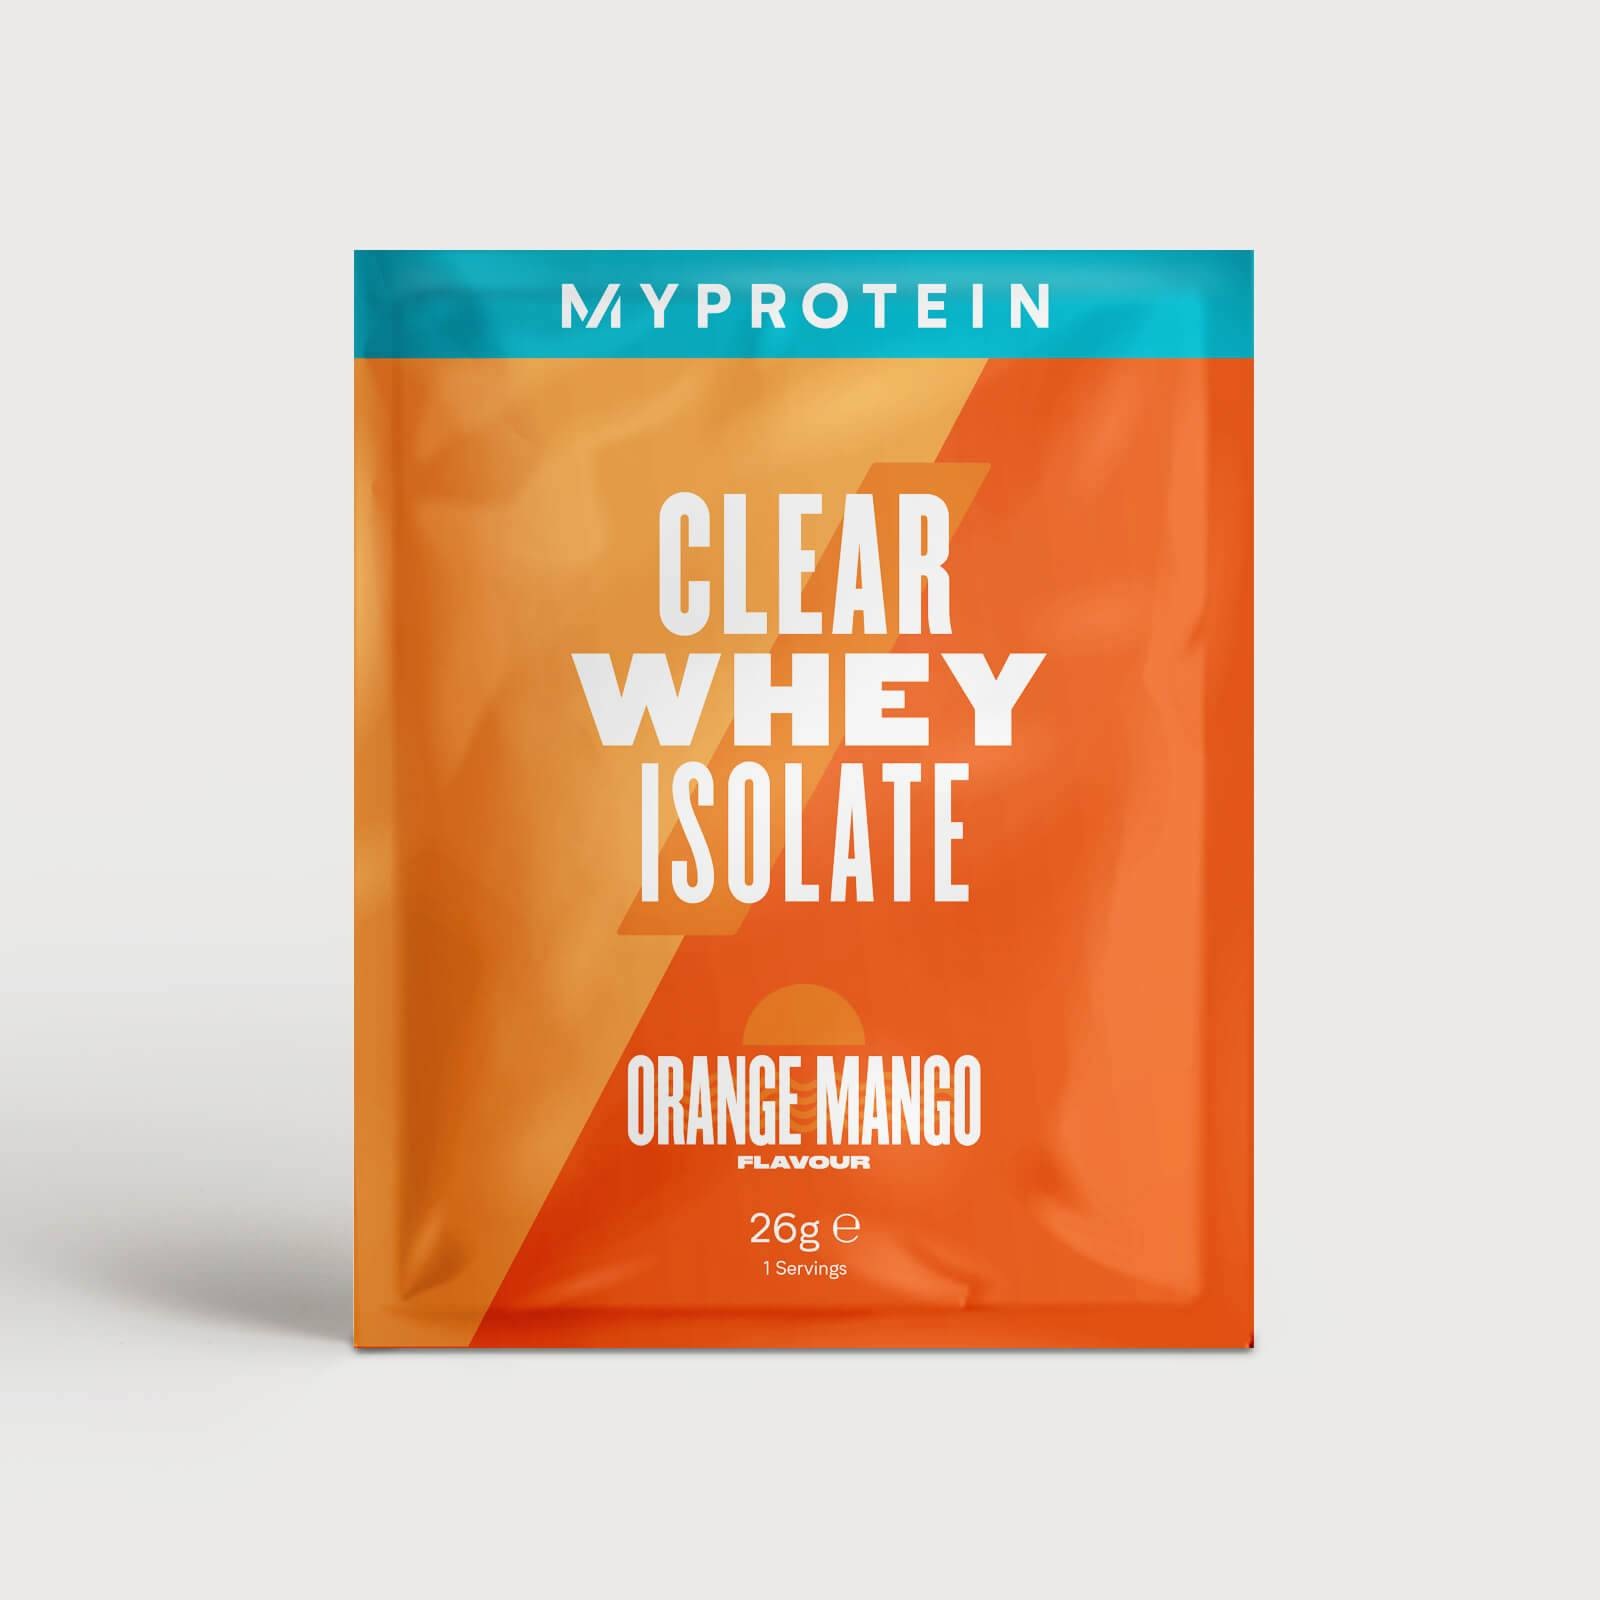 Myprotein Clear Whey Isolate (Sample) - 26g - Orange Mango